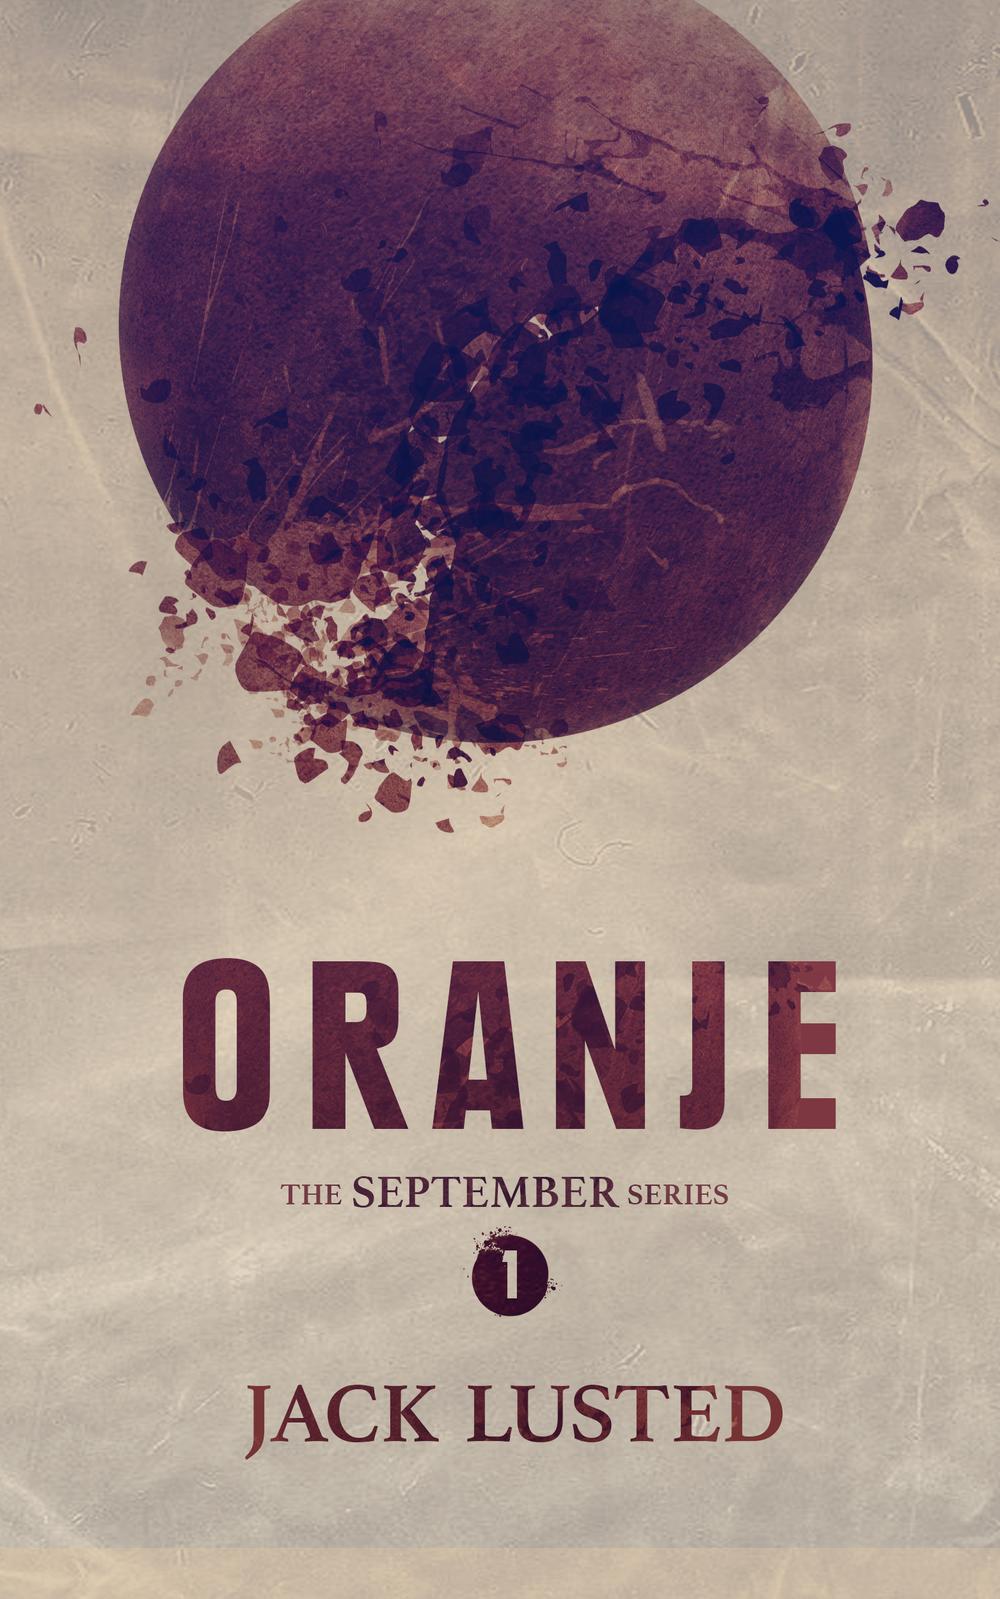 The ebook cover for Oranje .